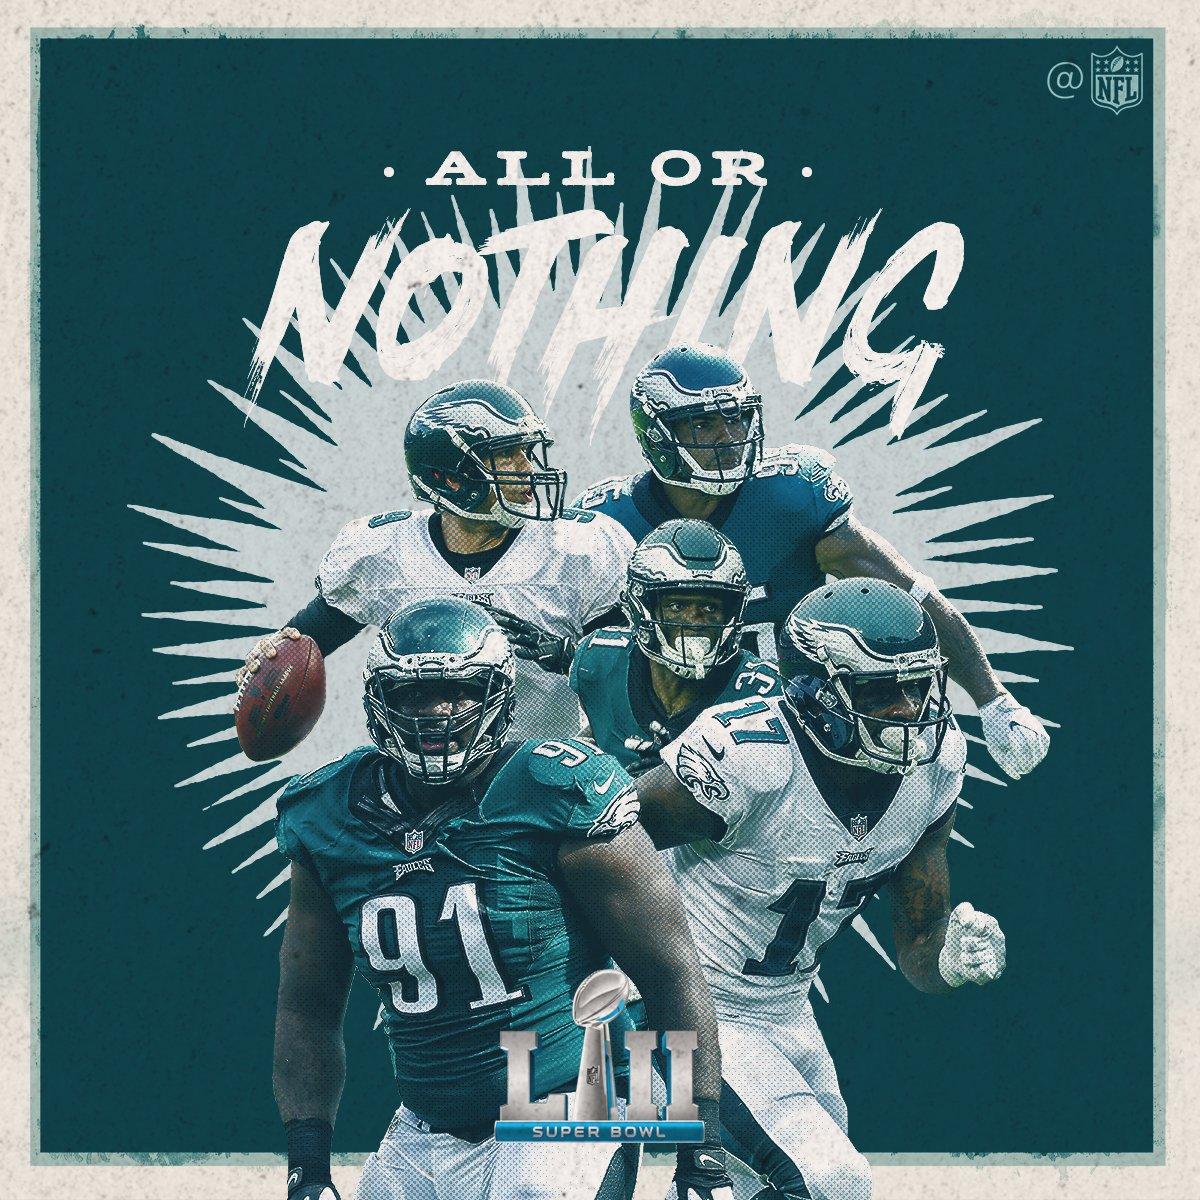 Philadelphia @Eagles = NFC CHAMPS! #FlyEaglesFly #SBLII https://t.co/AVnk0lzvNy